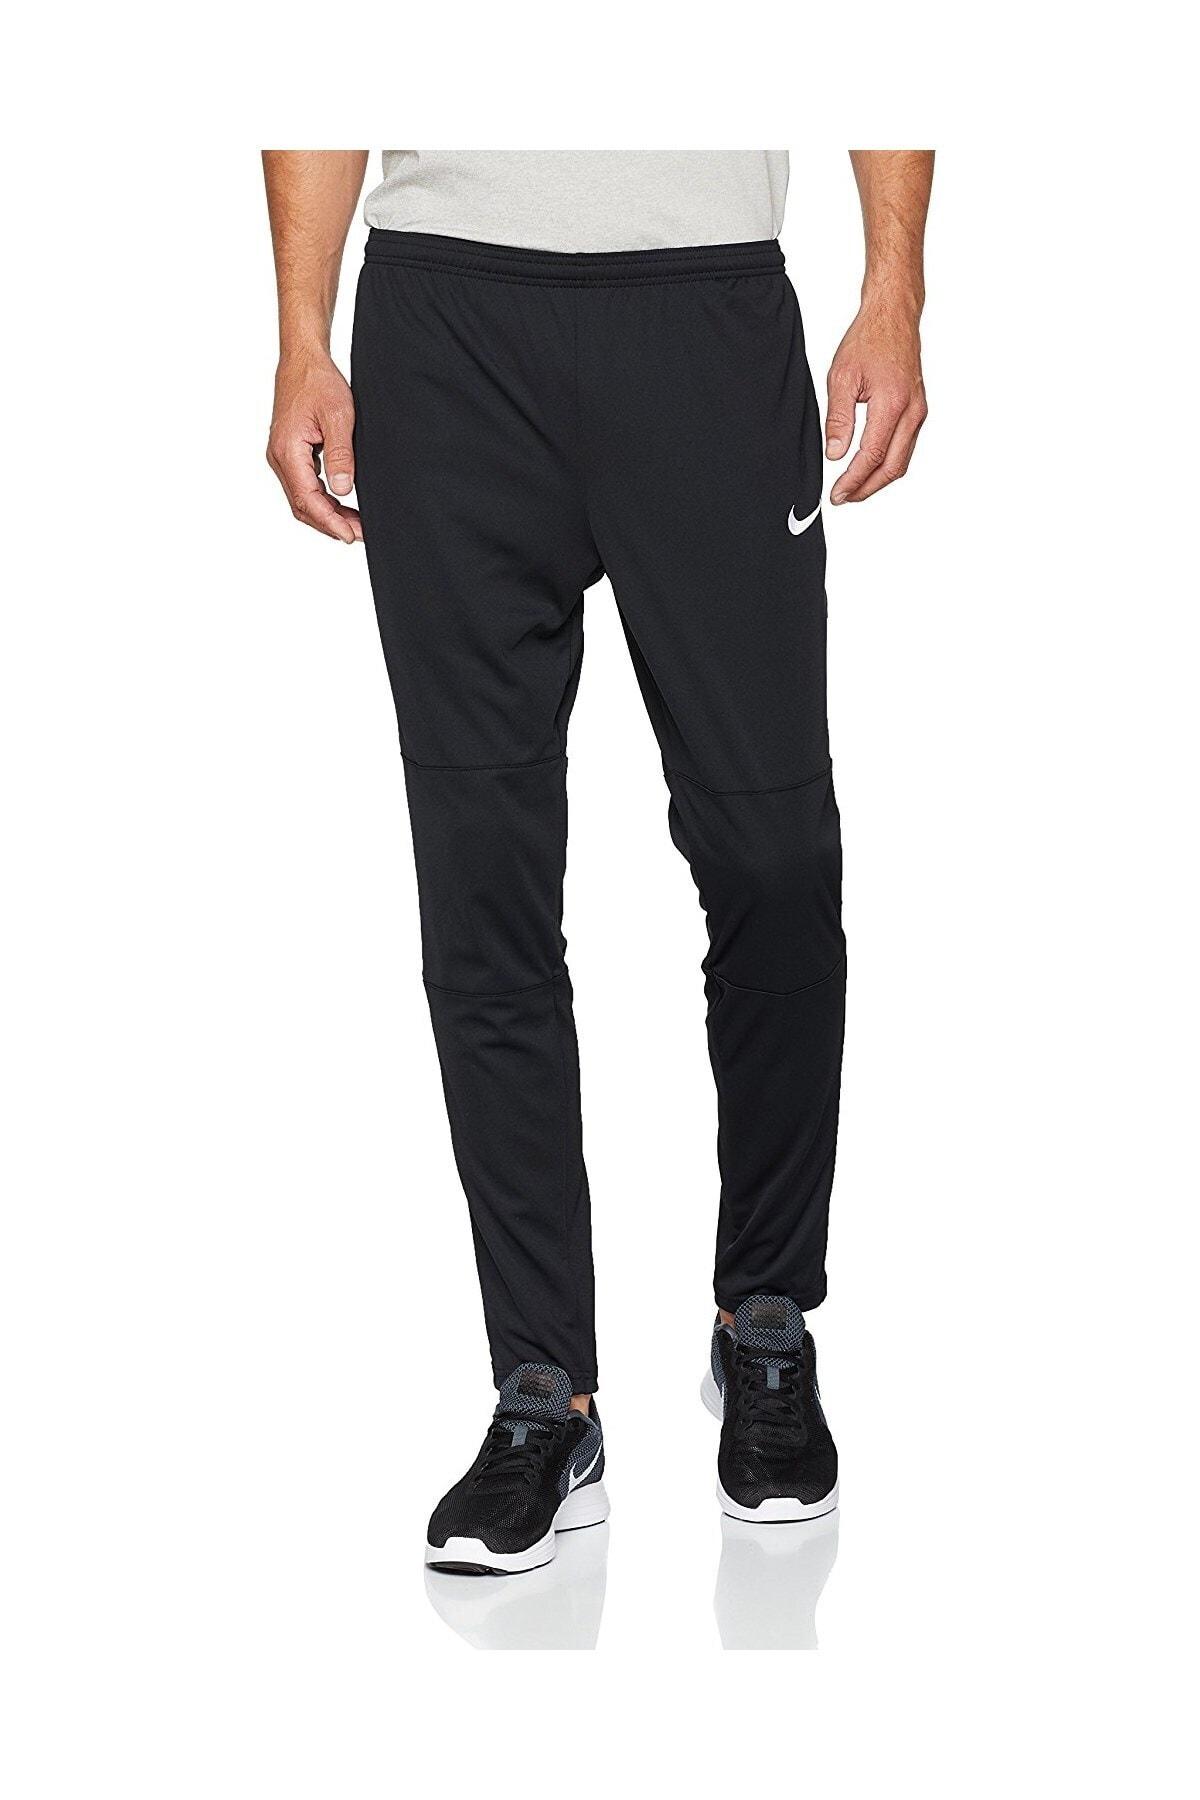 Nike Erkek Siyah Eşofman Altı Aa2086-010 1